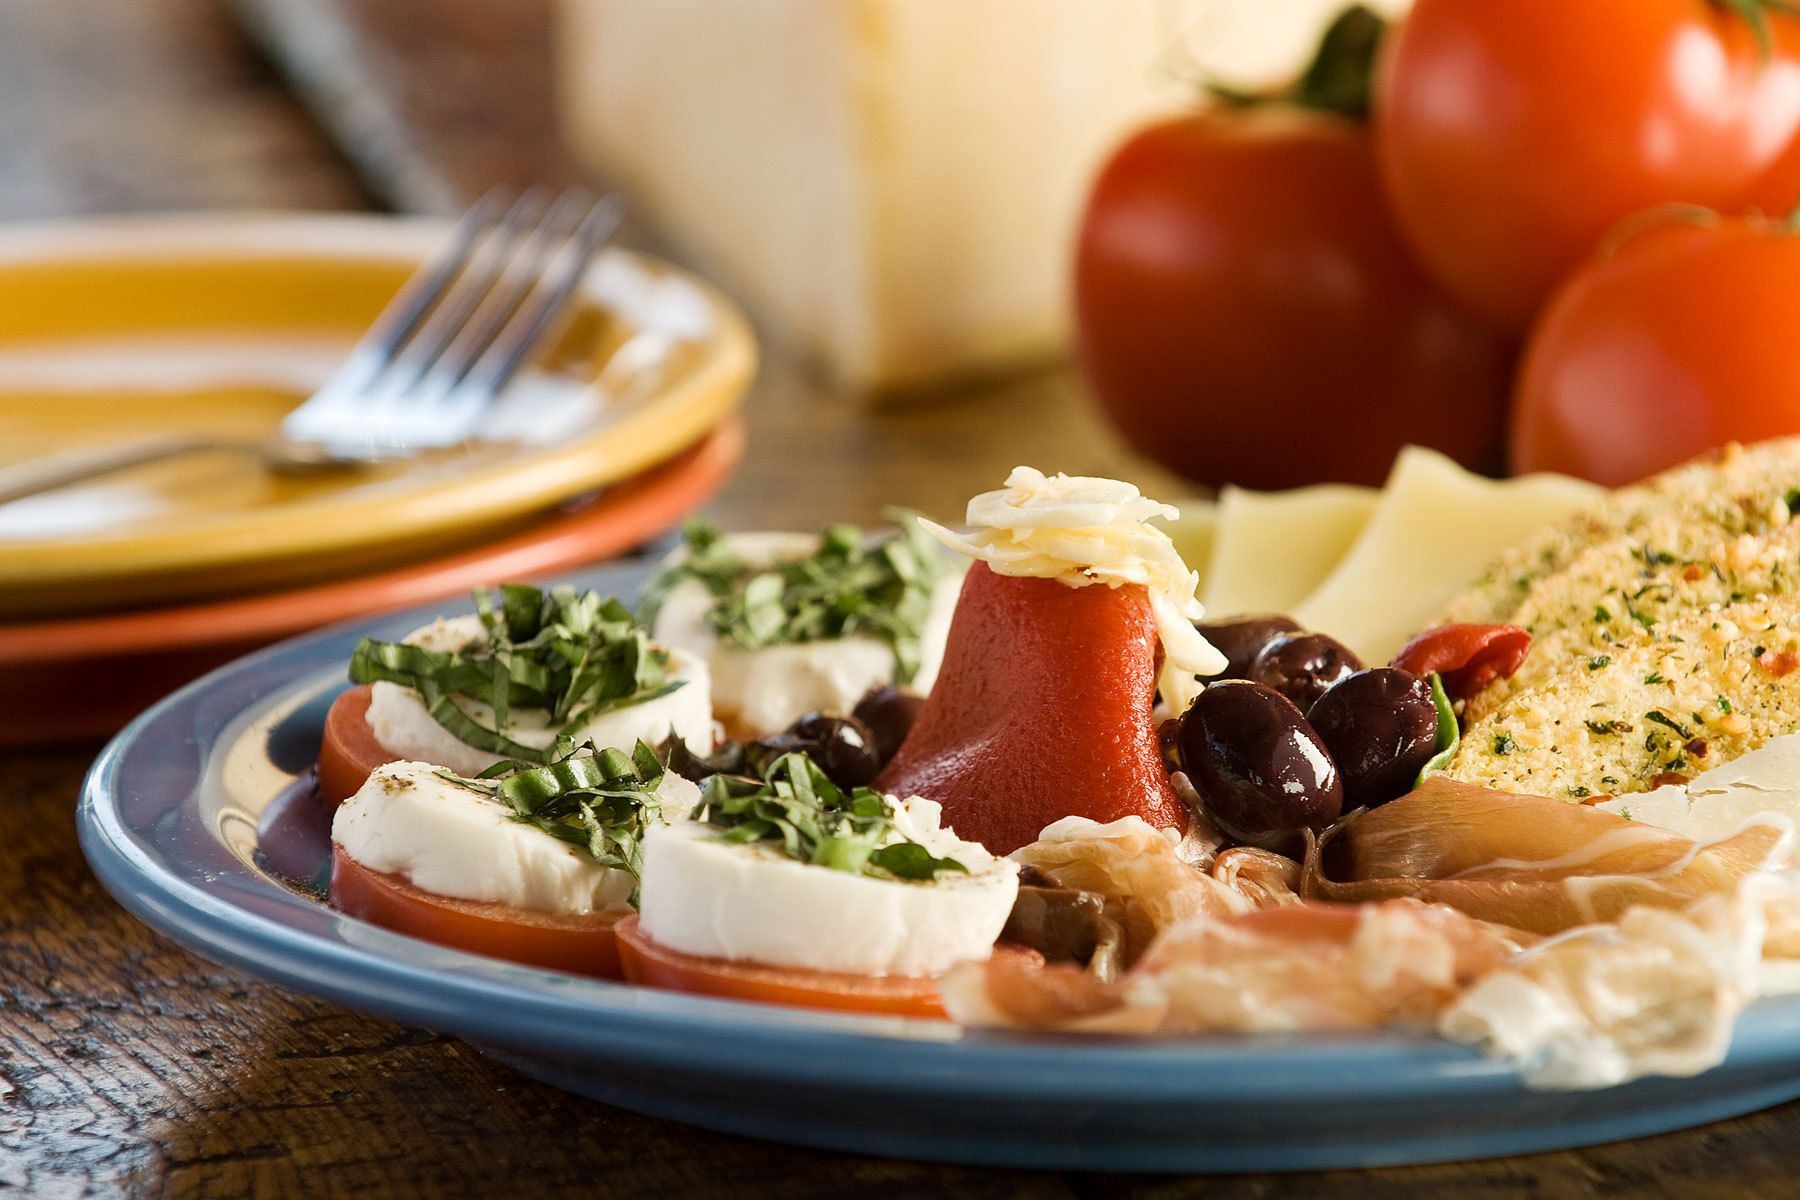 Fresh Mozzarella, Roasted Pepper & Tomato Salad